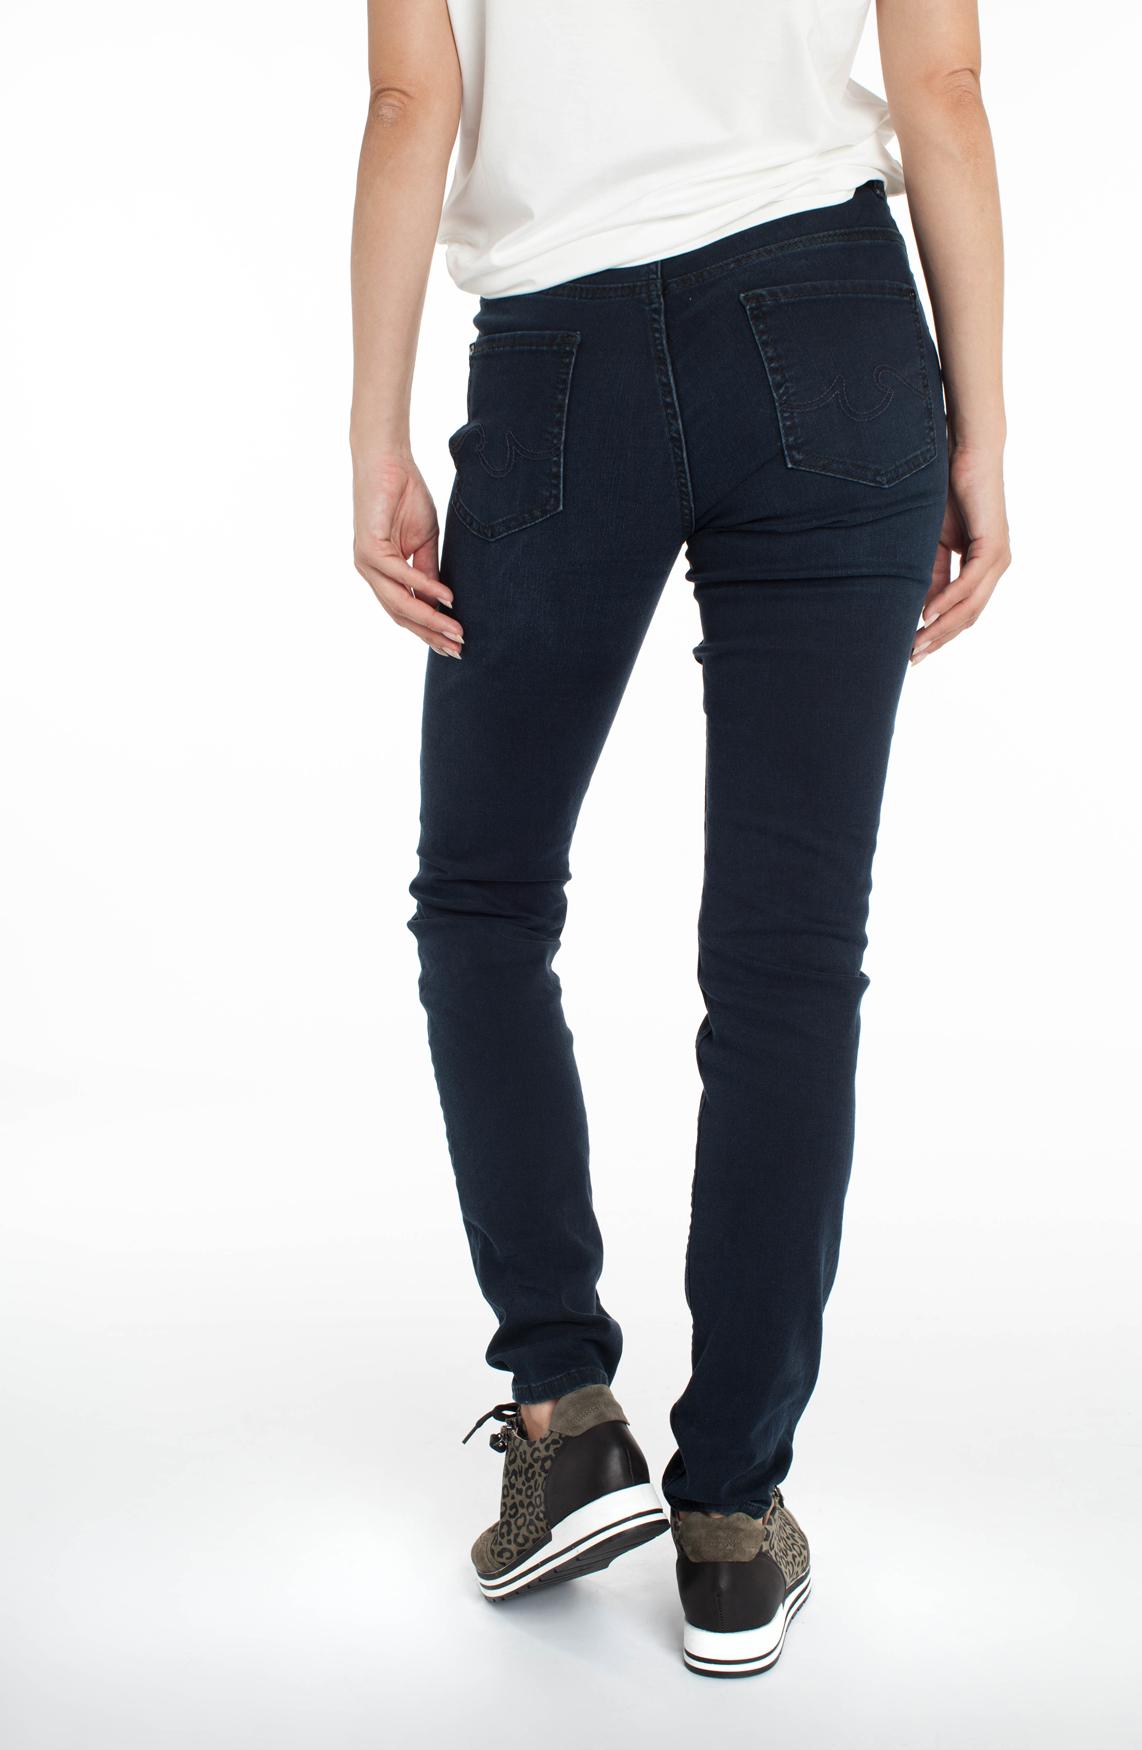 Rosner Dames L34 Audrey high waist jeans Blauw